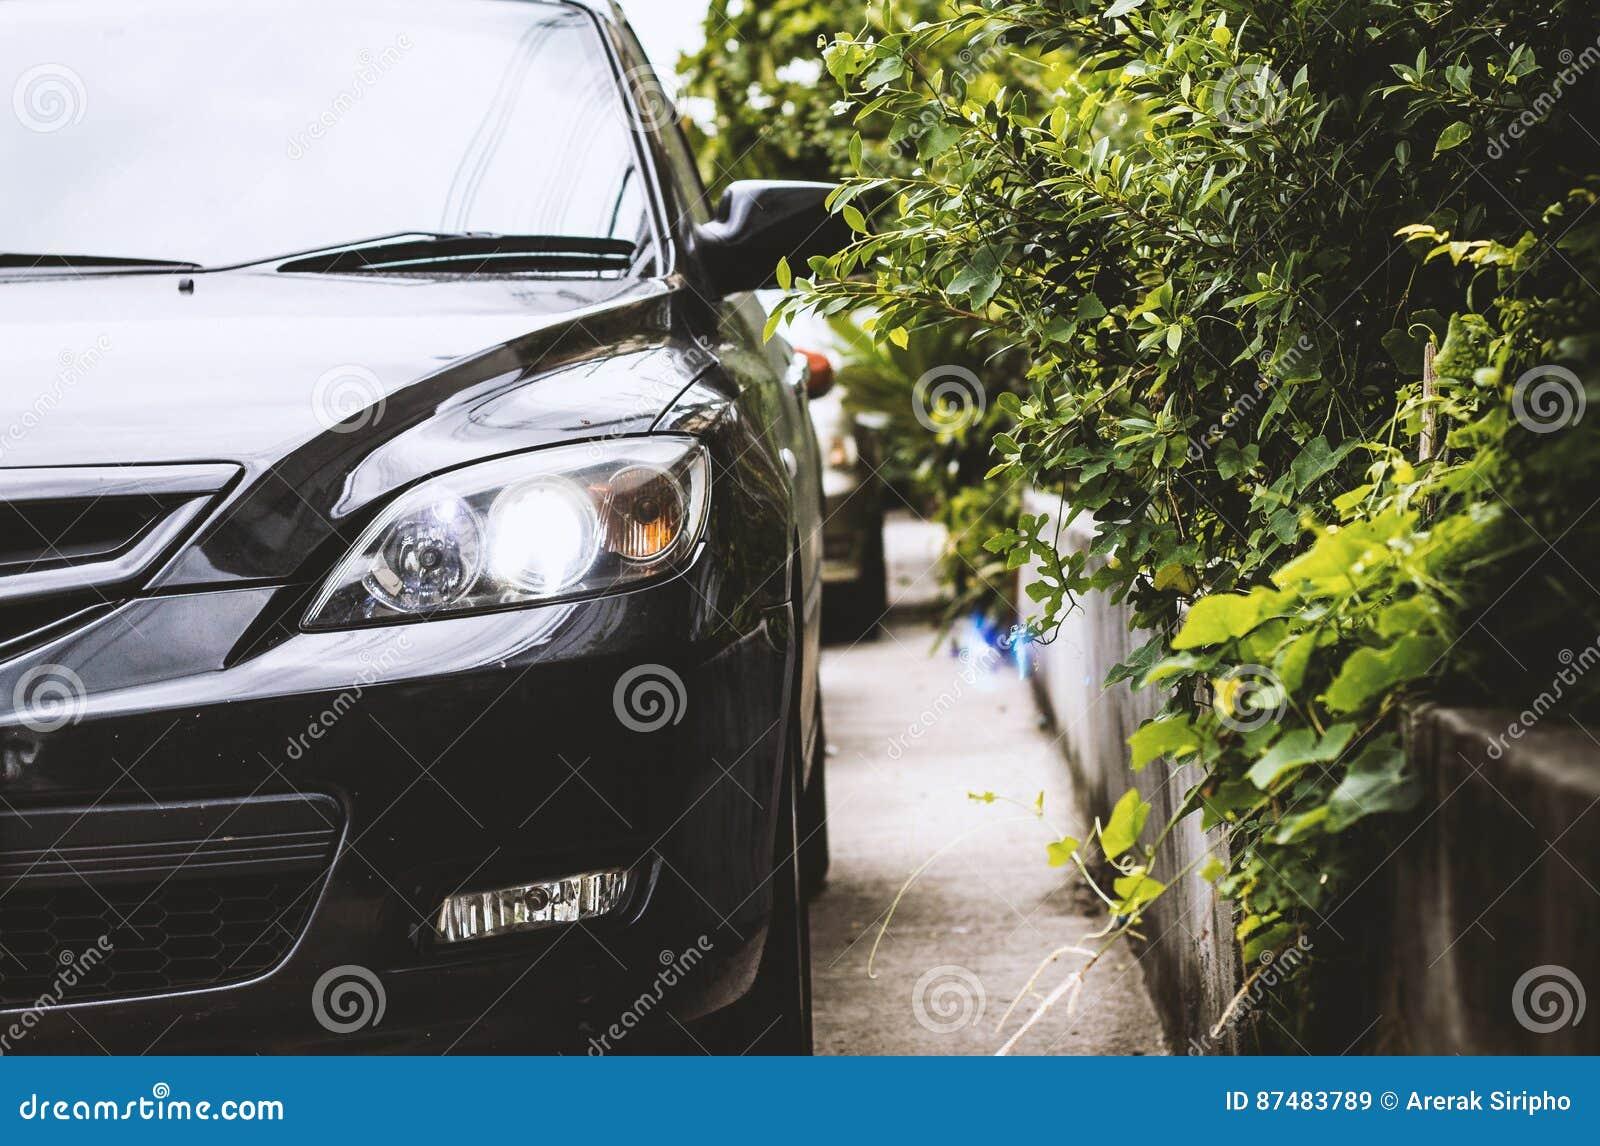 closeup of headlight of car stock photo 33782964. Black Bedroom Furniture Sets. Home Design Ideas